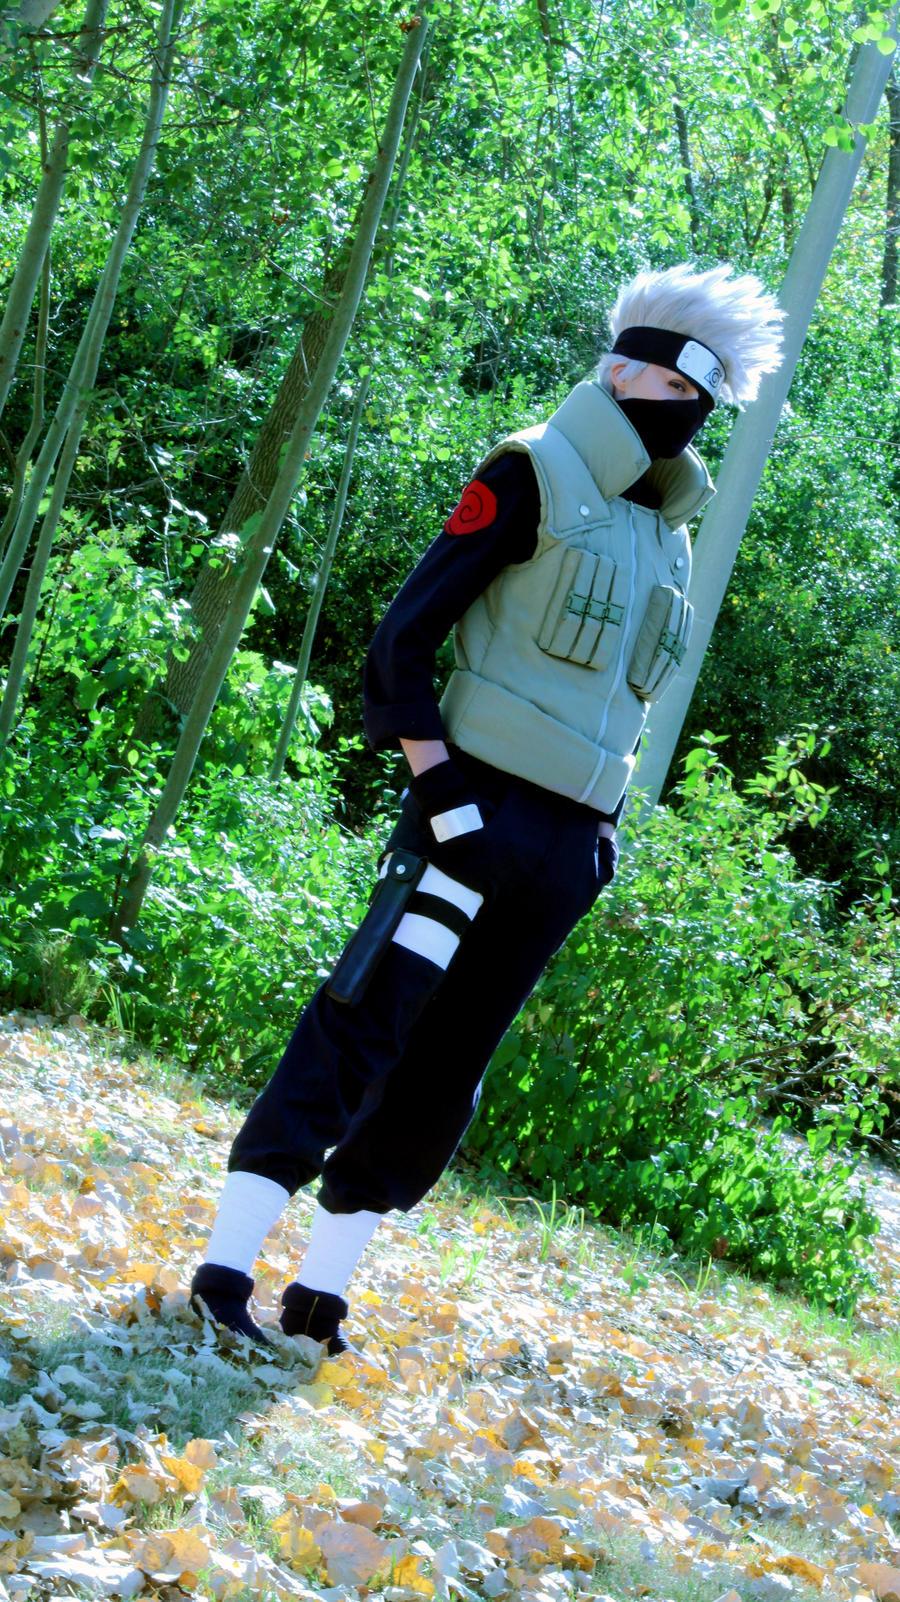 Ninja no sekai by Suki-Cosplay